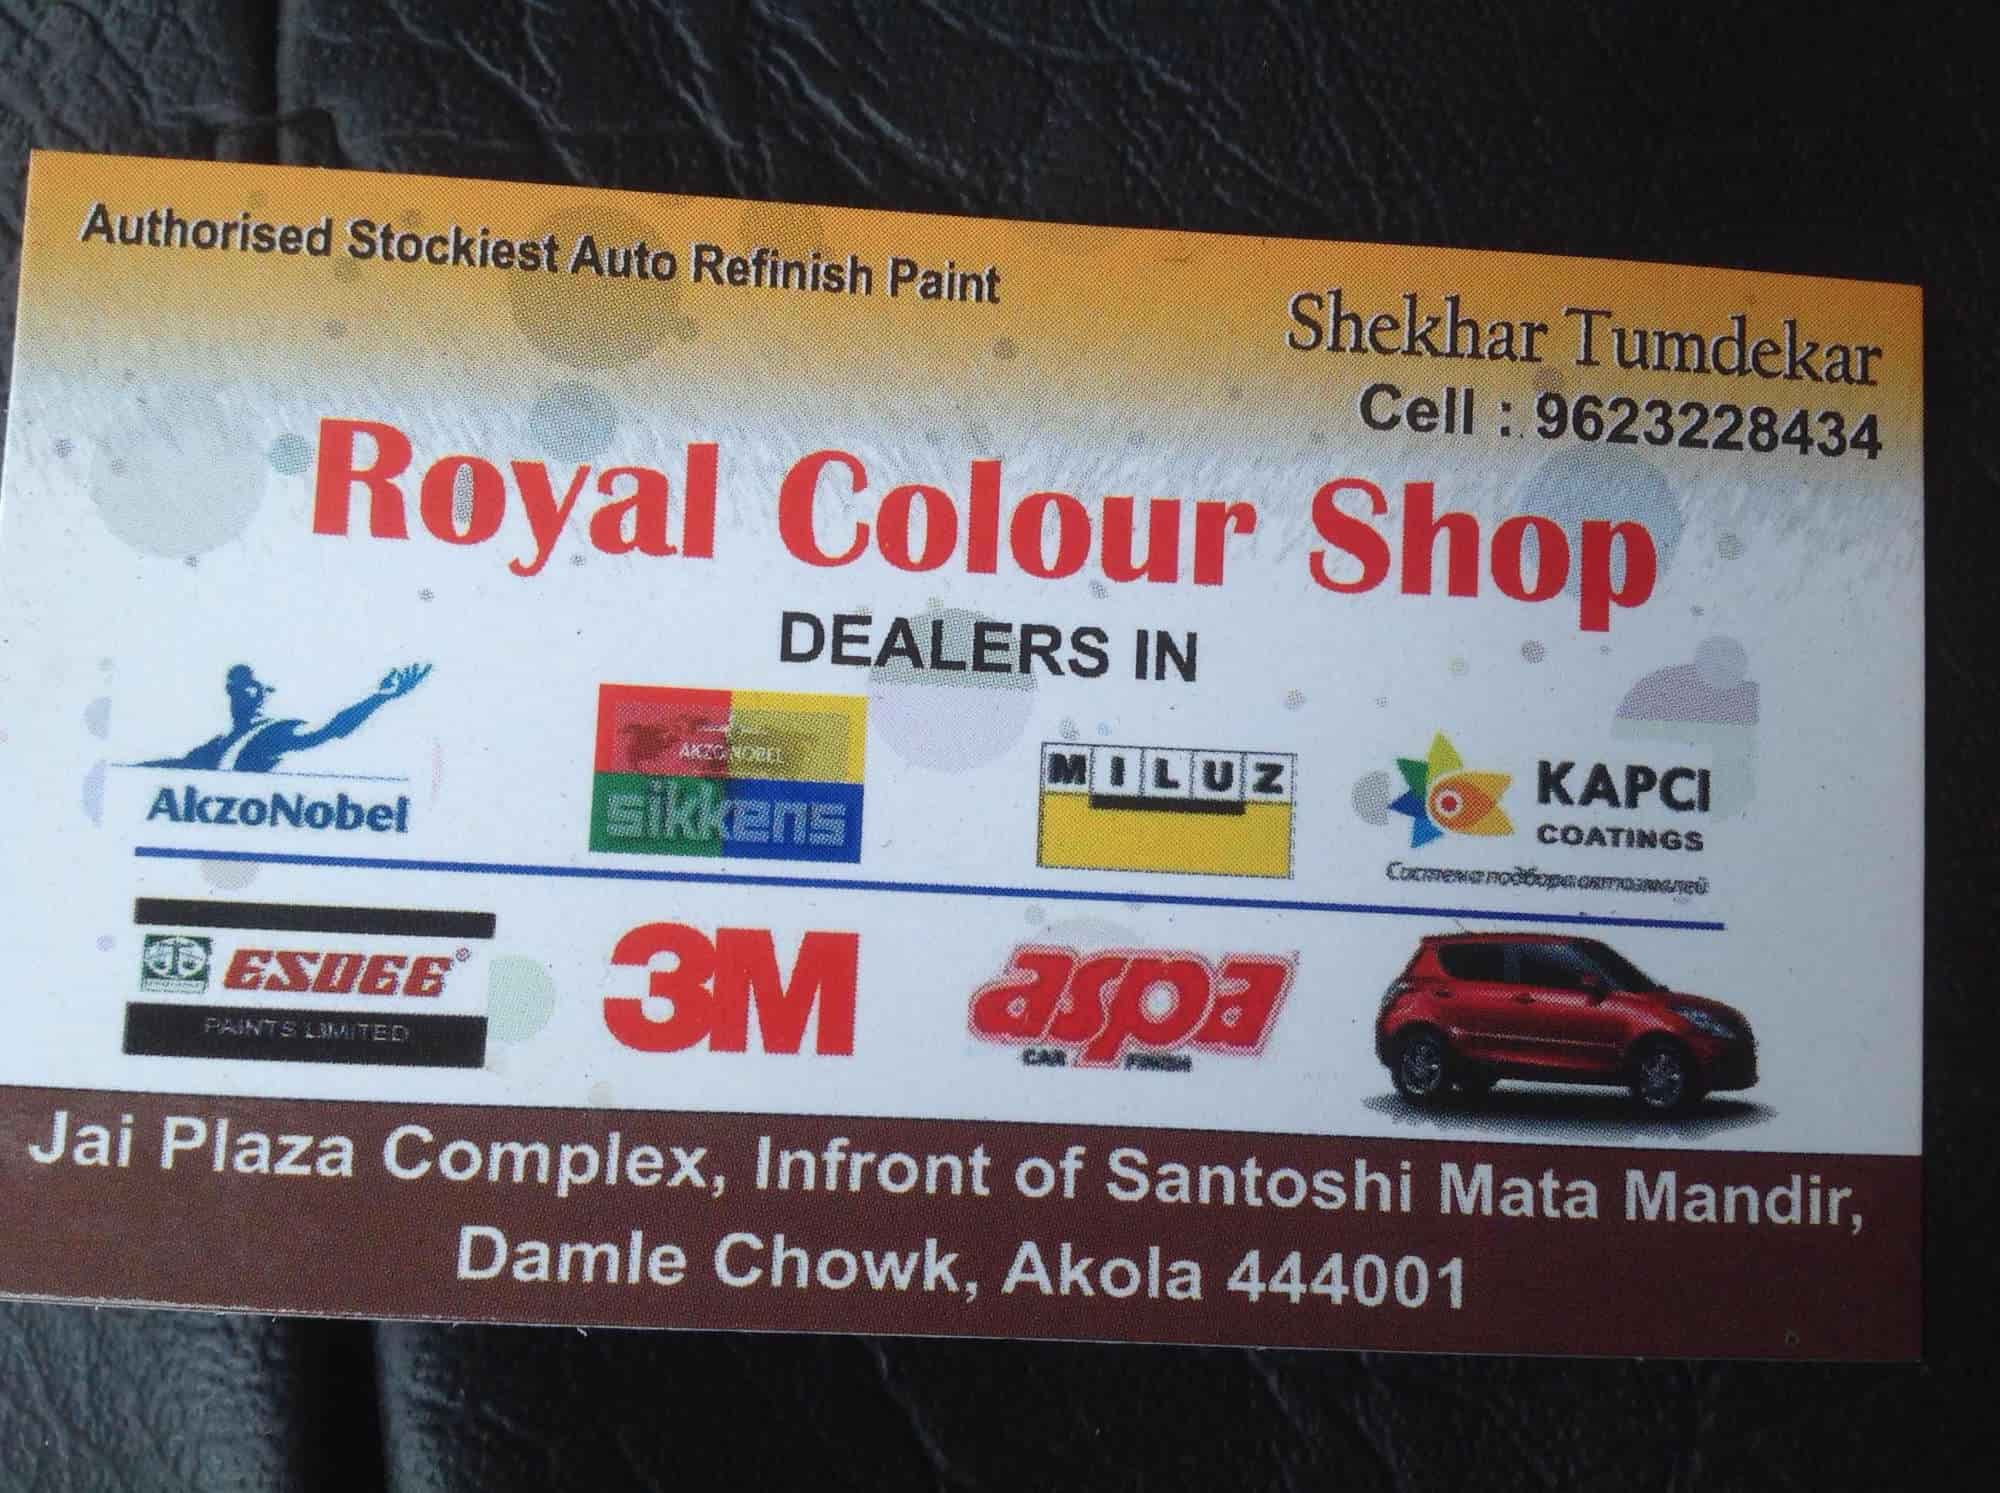 Royal Colour Shop, Tilak Road - Paint Dealers in akola - Justdial